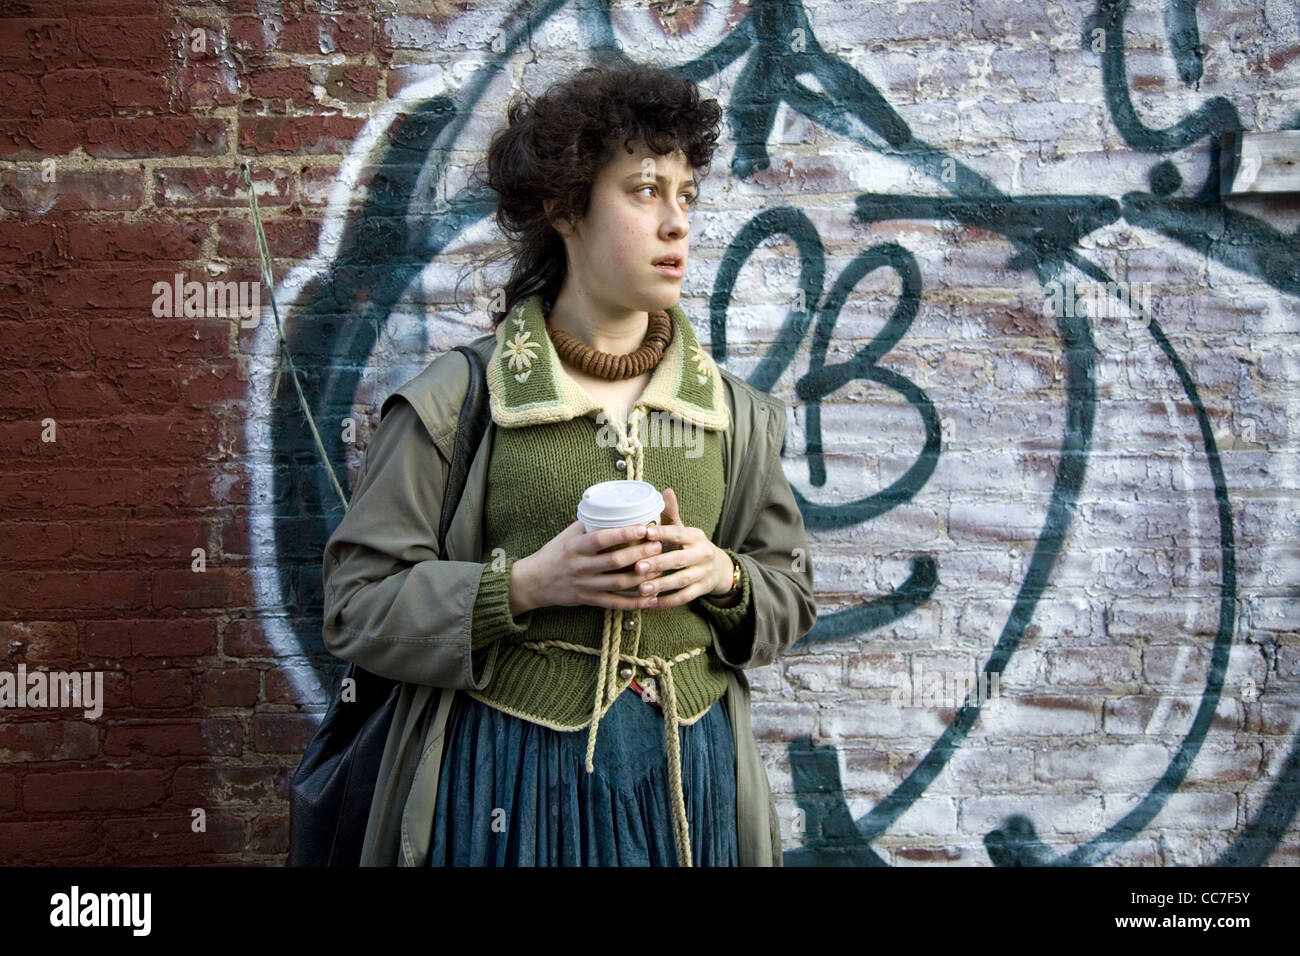 Jeune femme avec une tasse de café, Brooklyn, New York. Photo Stock